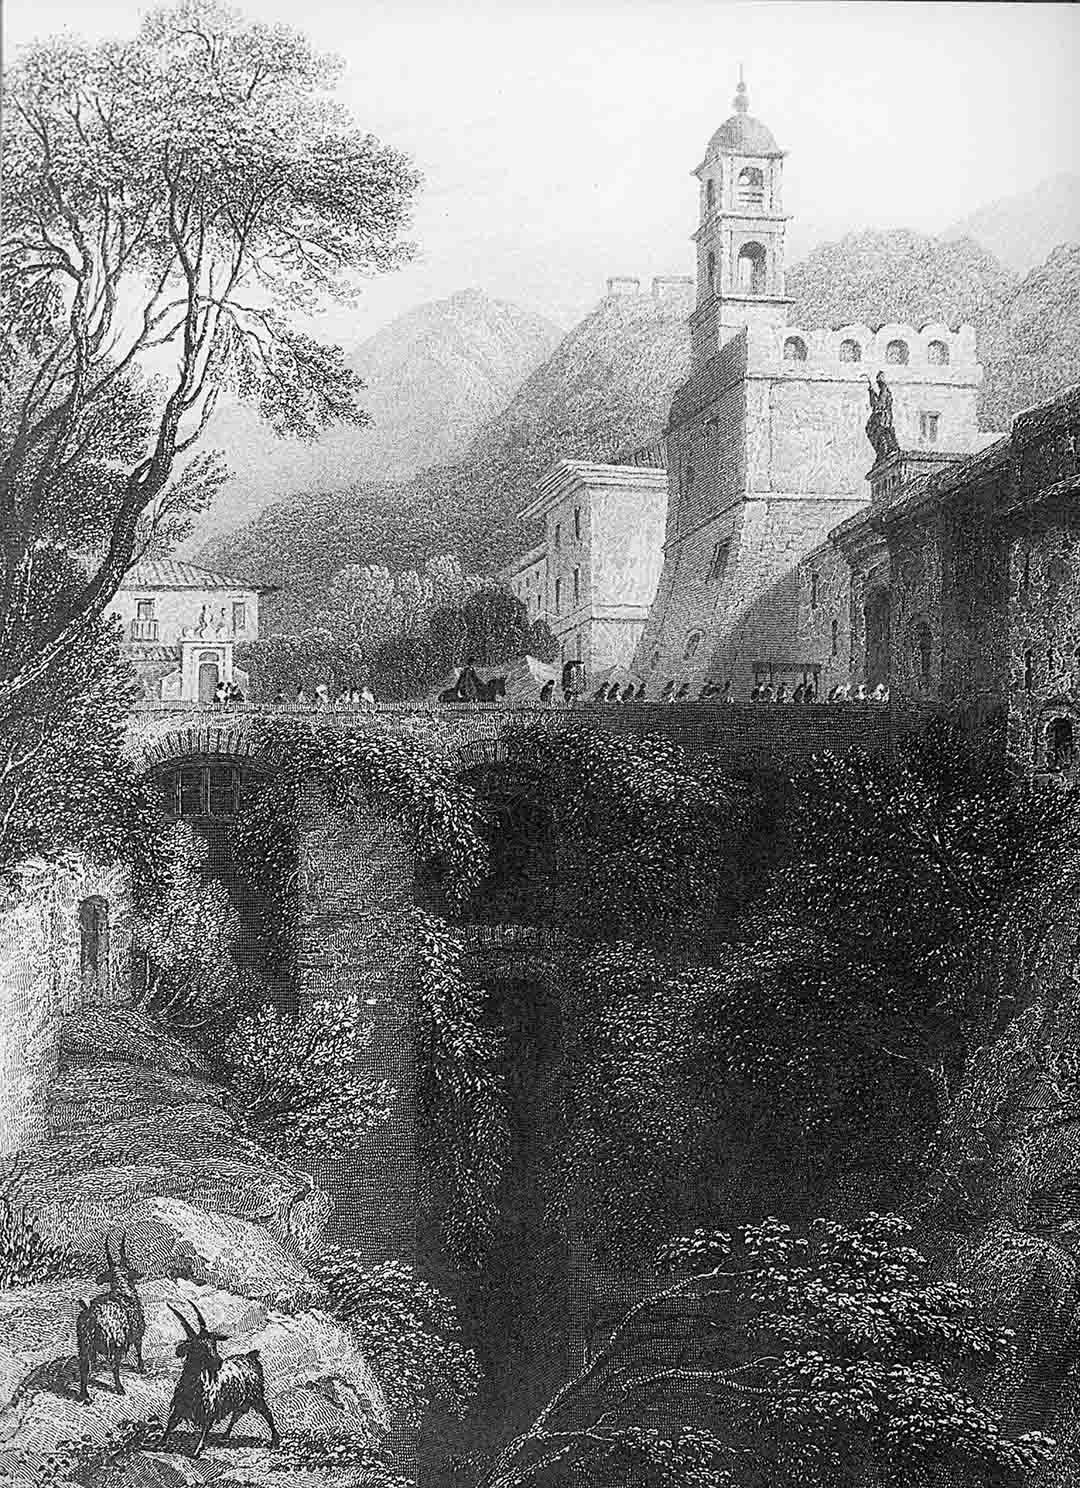 William BROCKEDON - James TIBBITTS WILLMORE, The Gate of Sorrento from the ravine